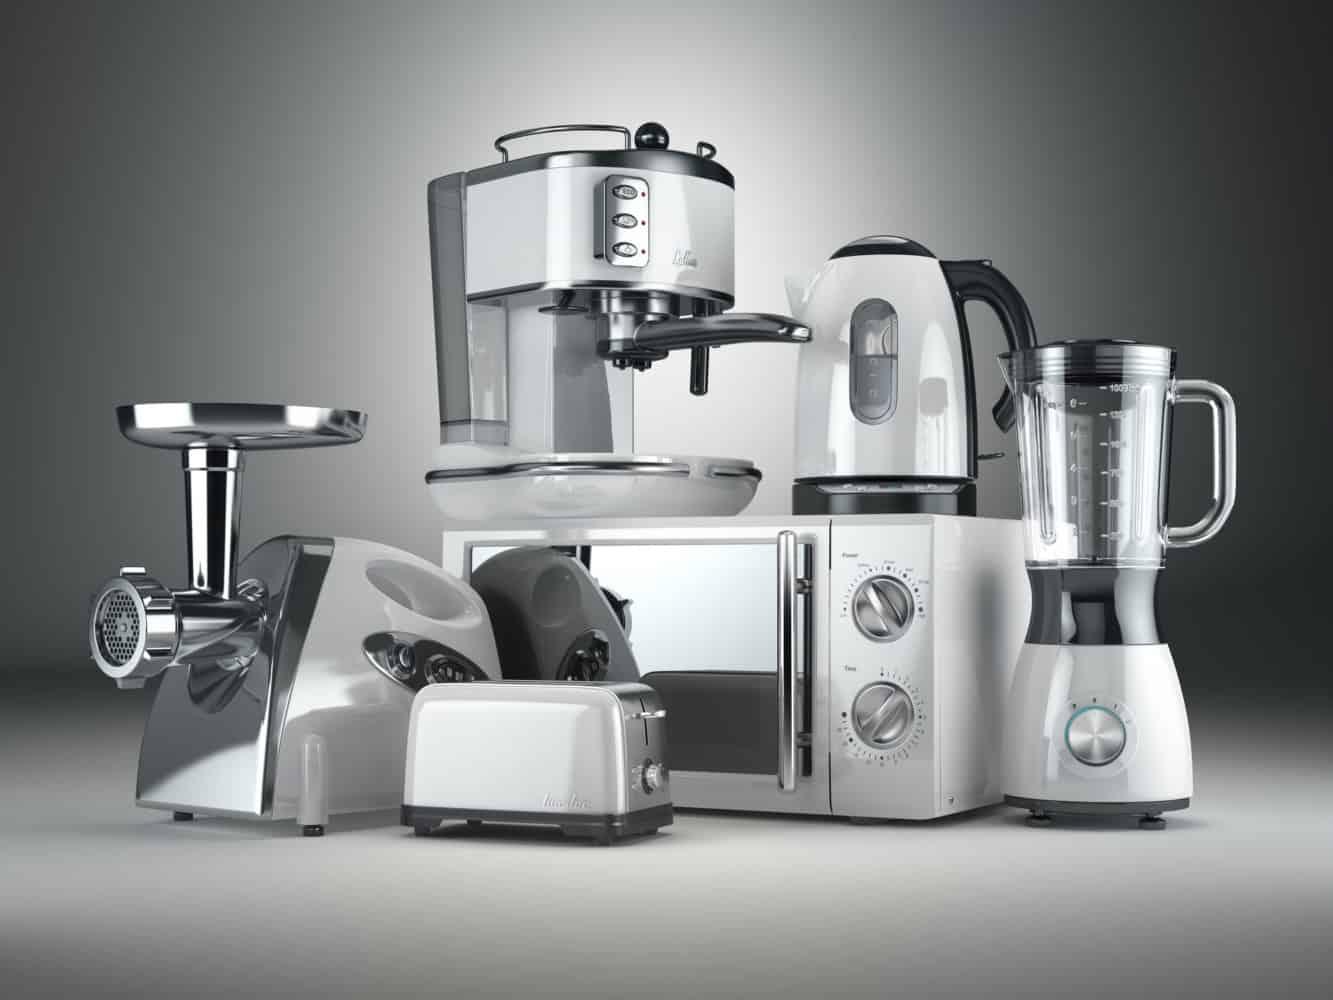 Must-Have Electric Kitchen Appliances List